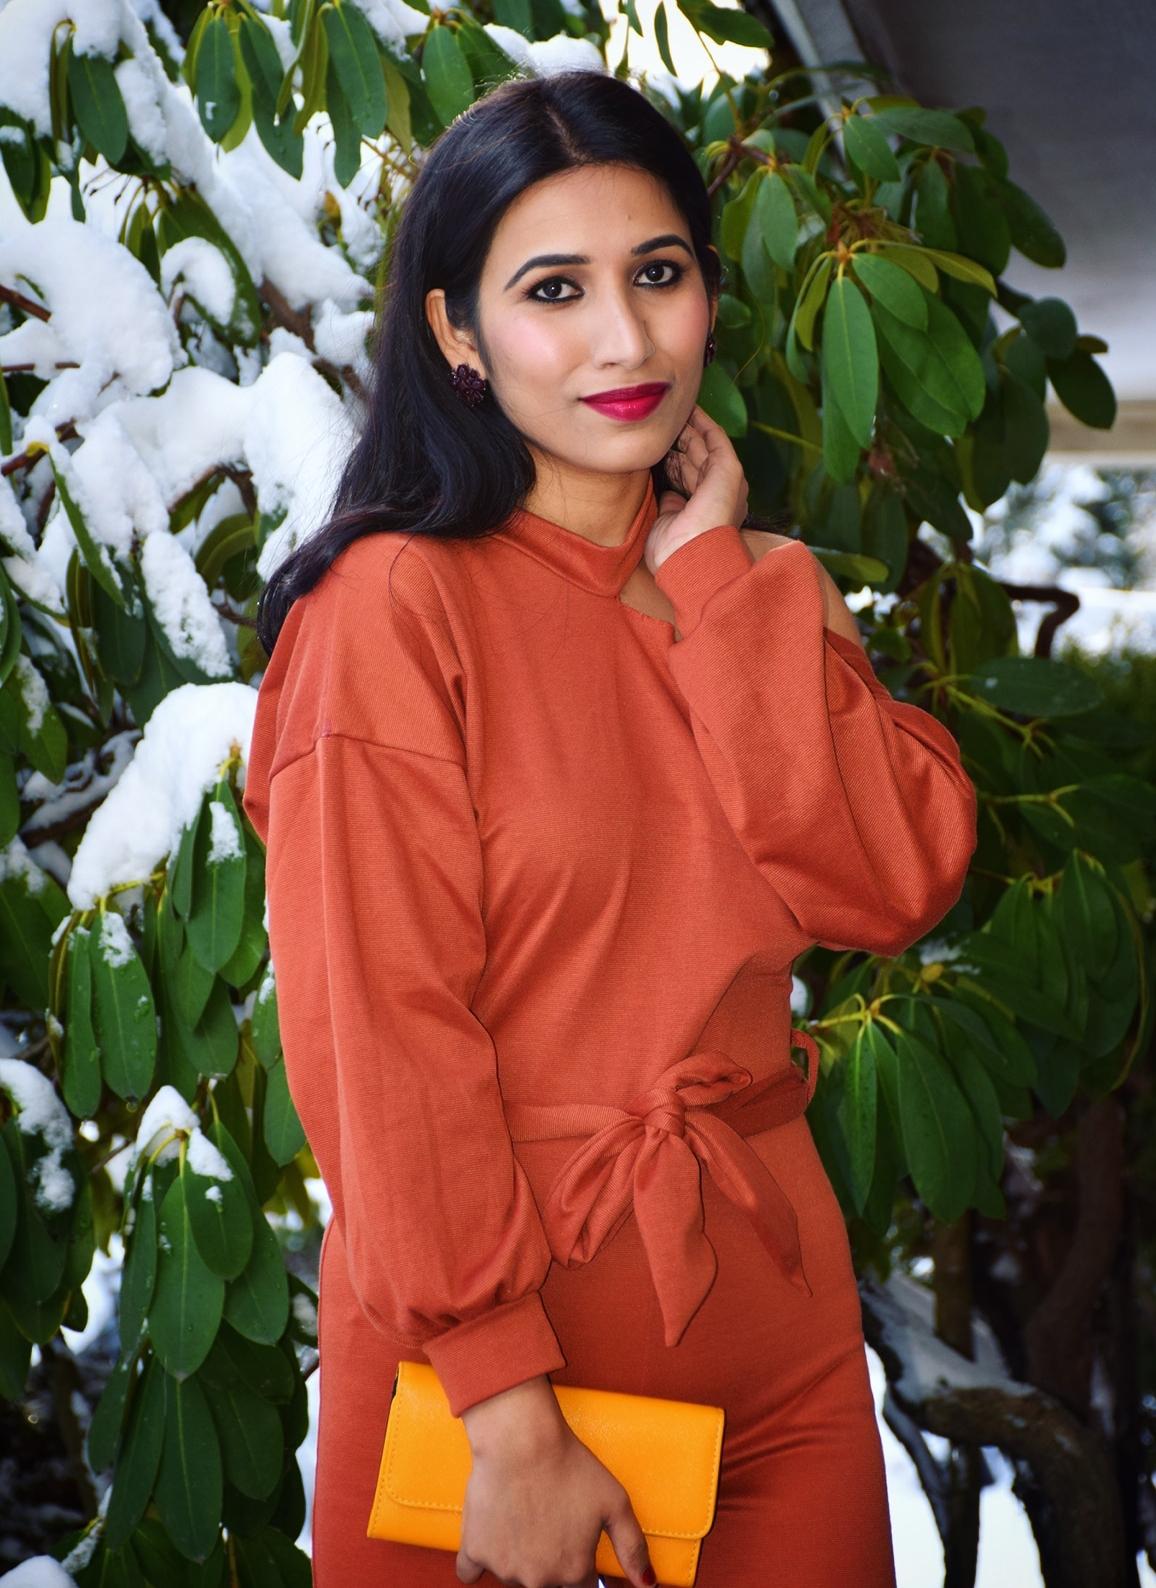 https://femmeluxebloggers.co.uk/collections/blogger-picks/products/black-cold-shoulder-long-sleeve-jumpsuit-hattie